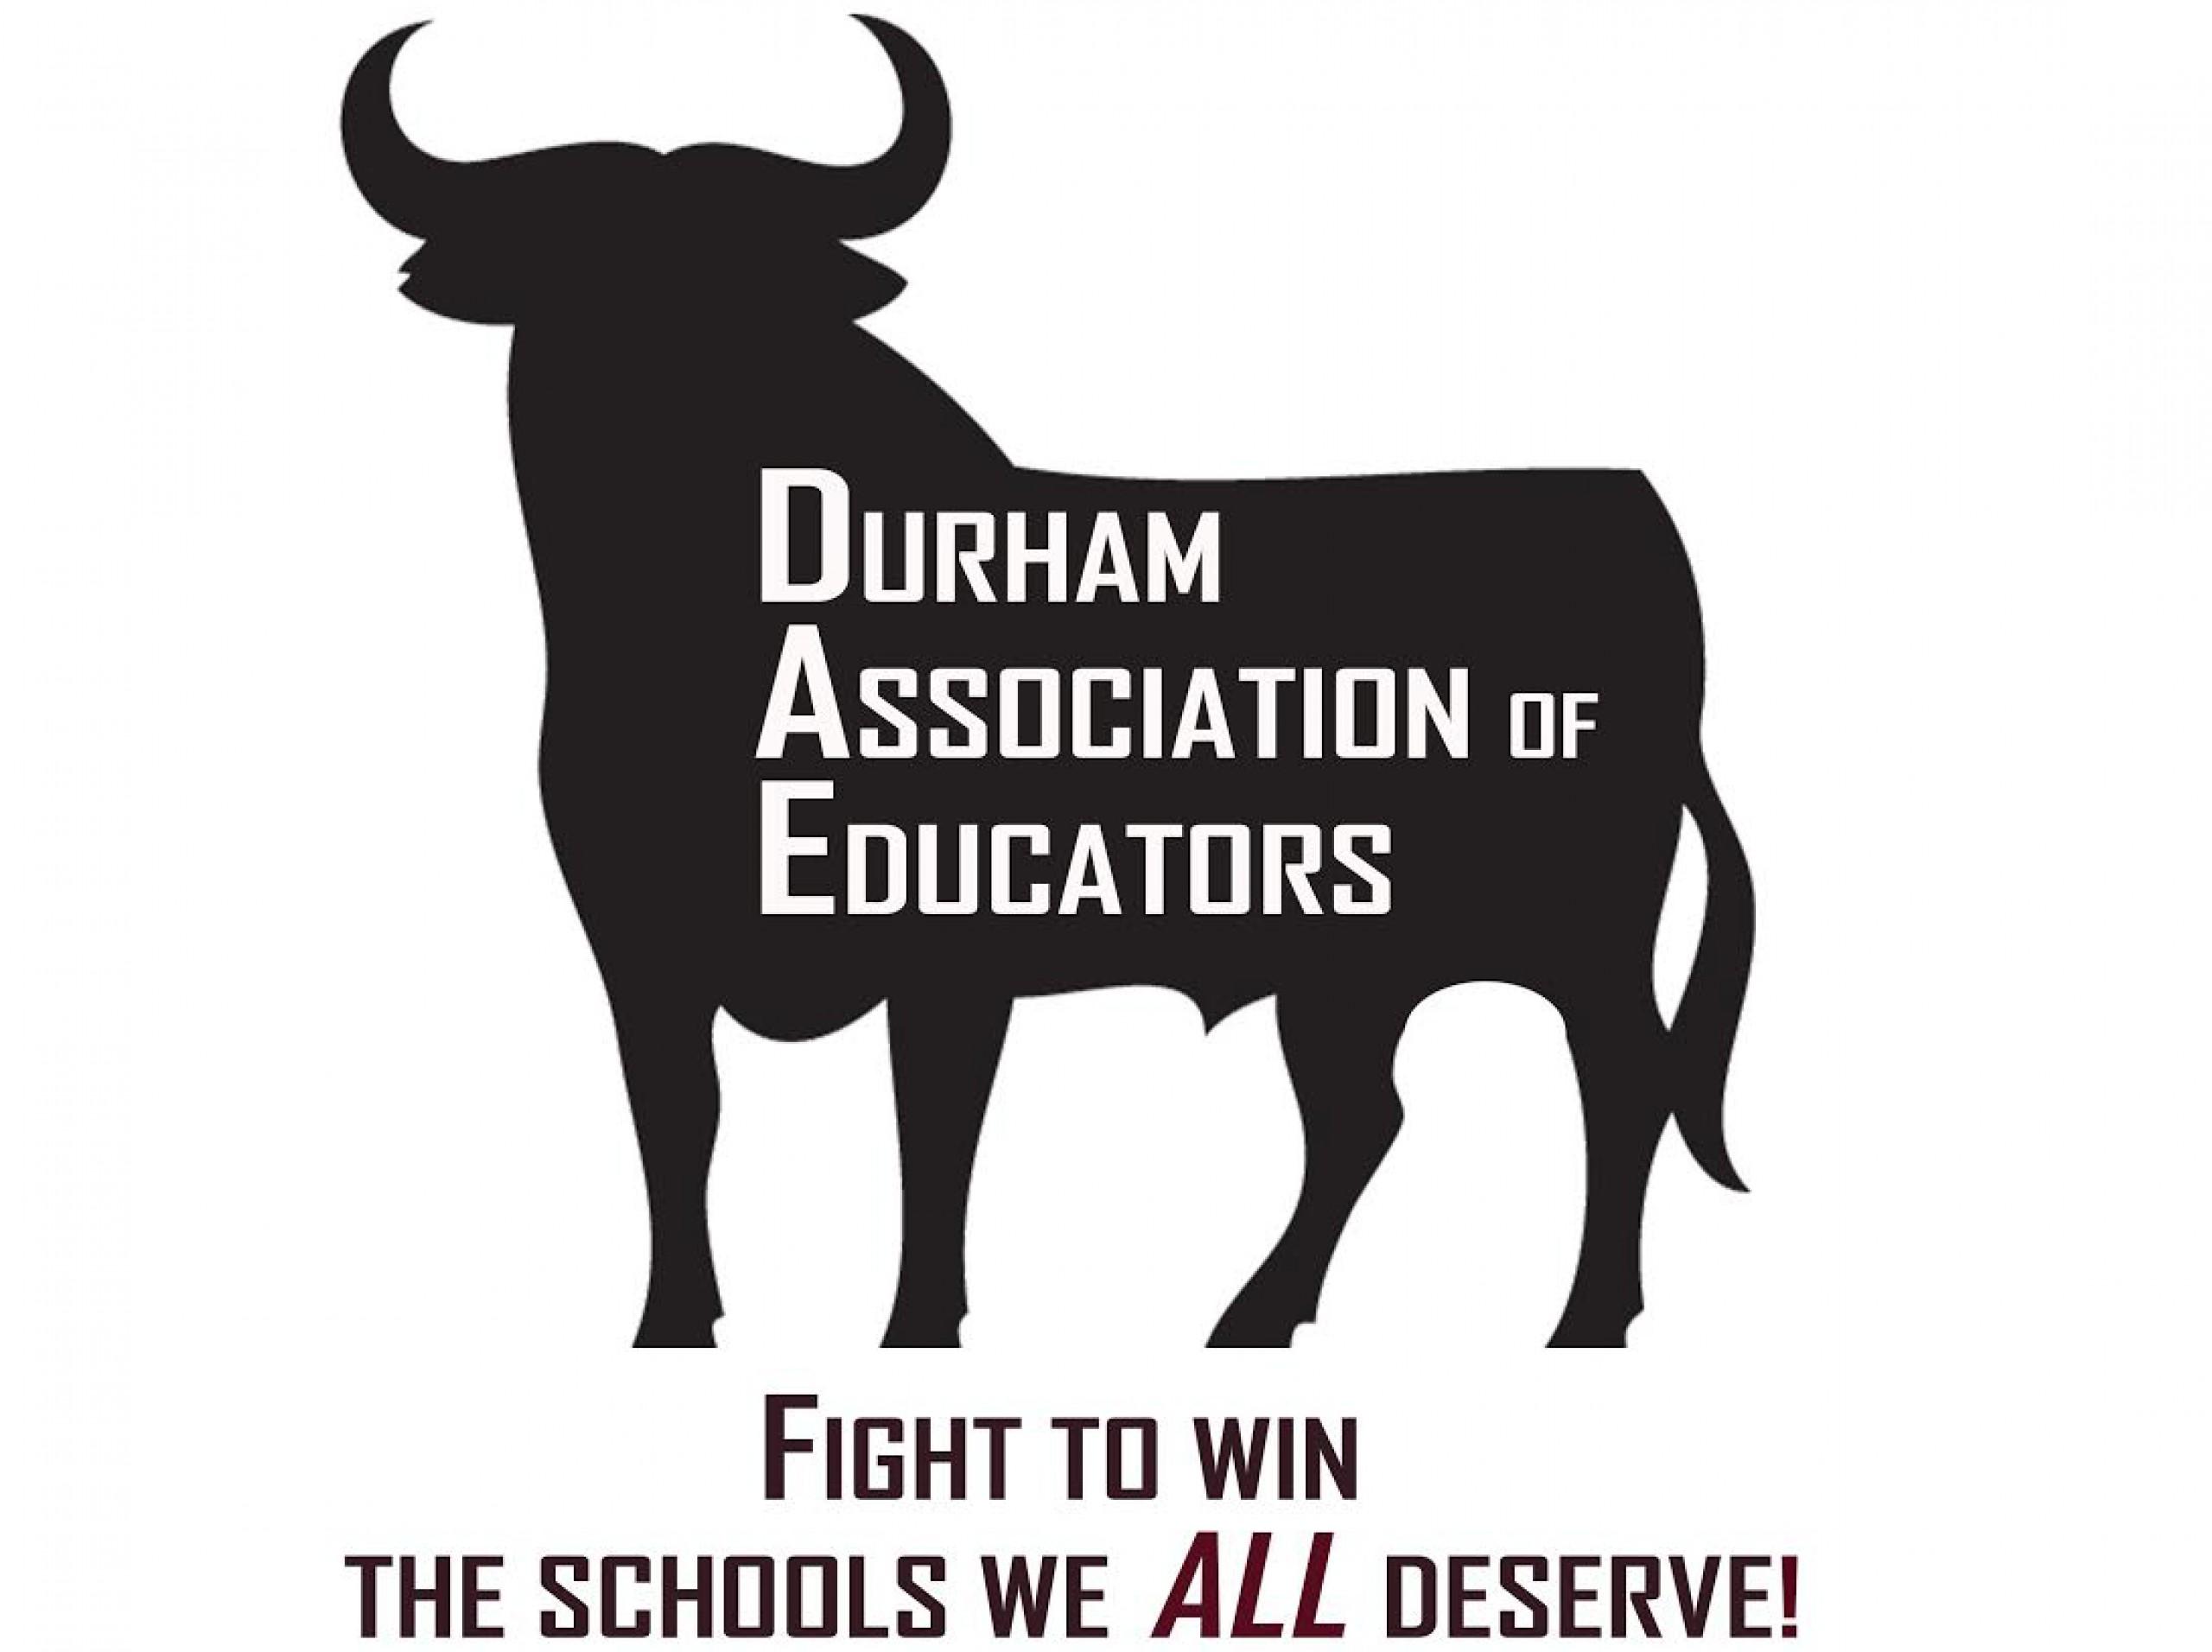 Durham Association of Educators